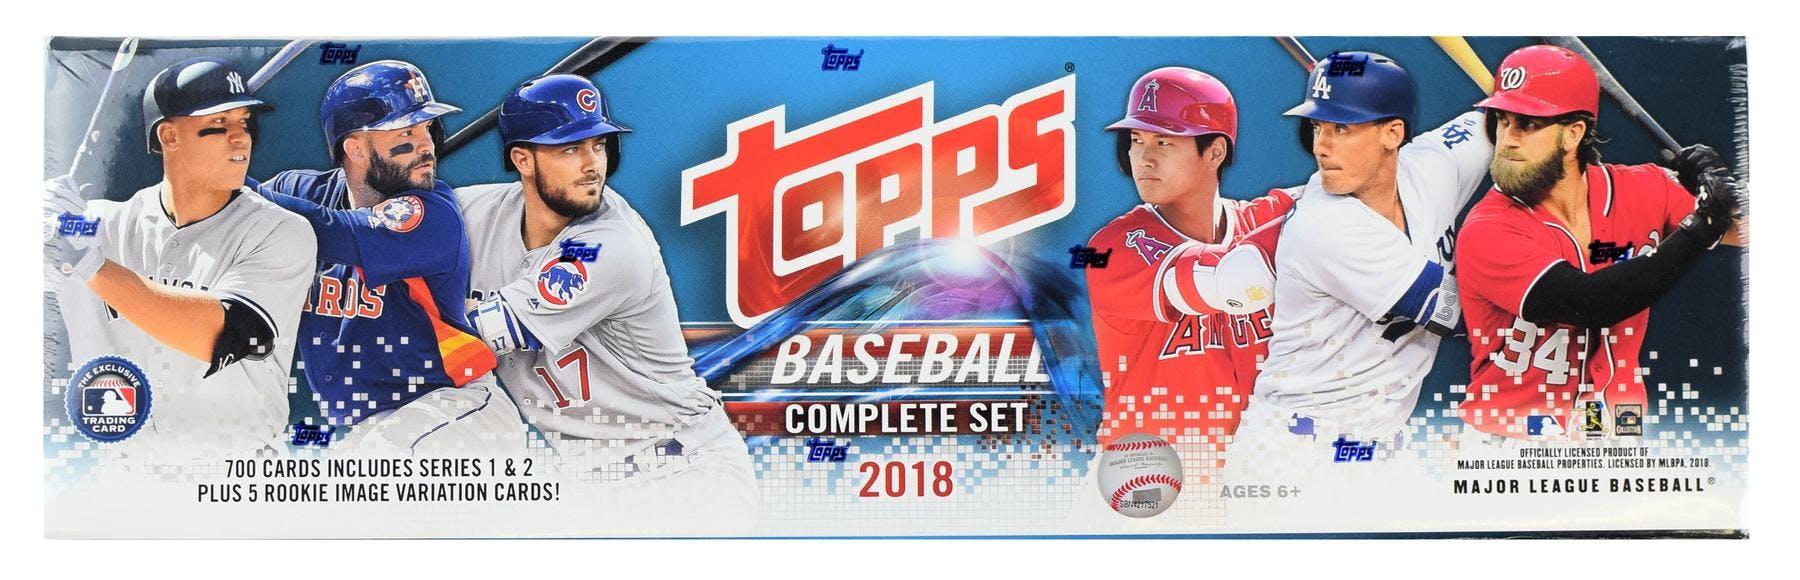 2018 Topps Factory Set Baseball Box